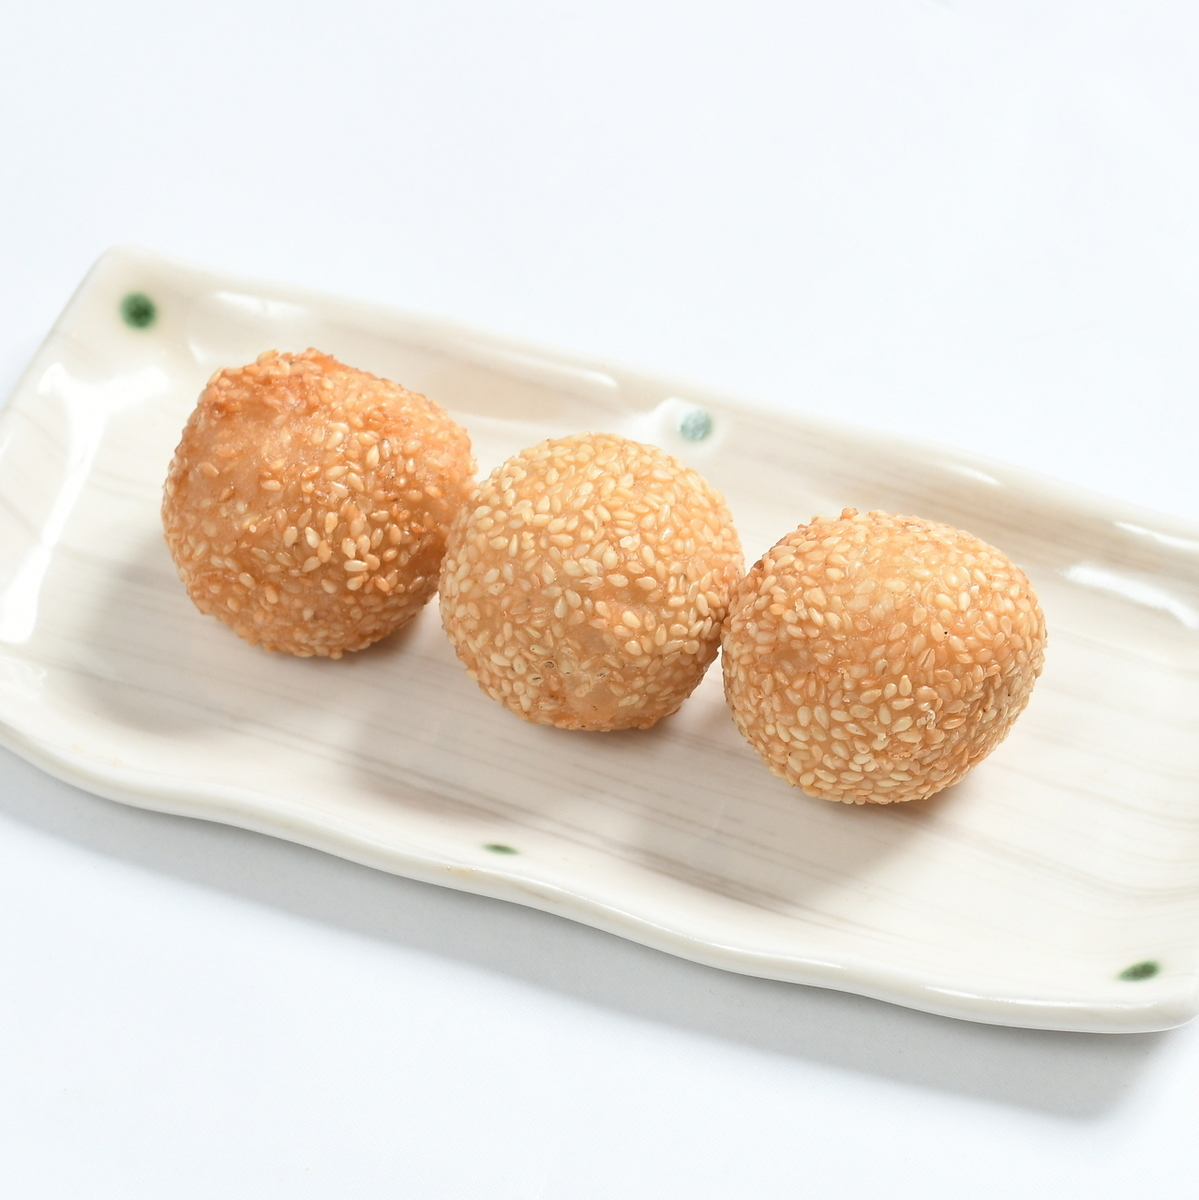 Sesame dumplings